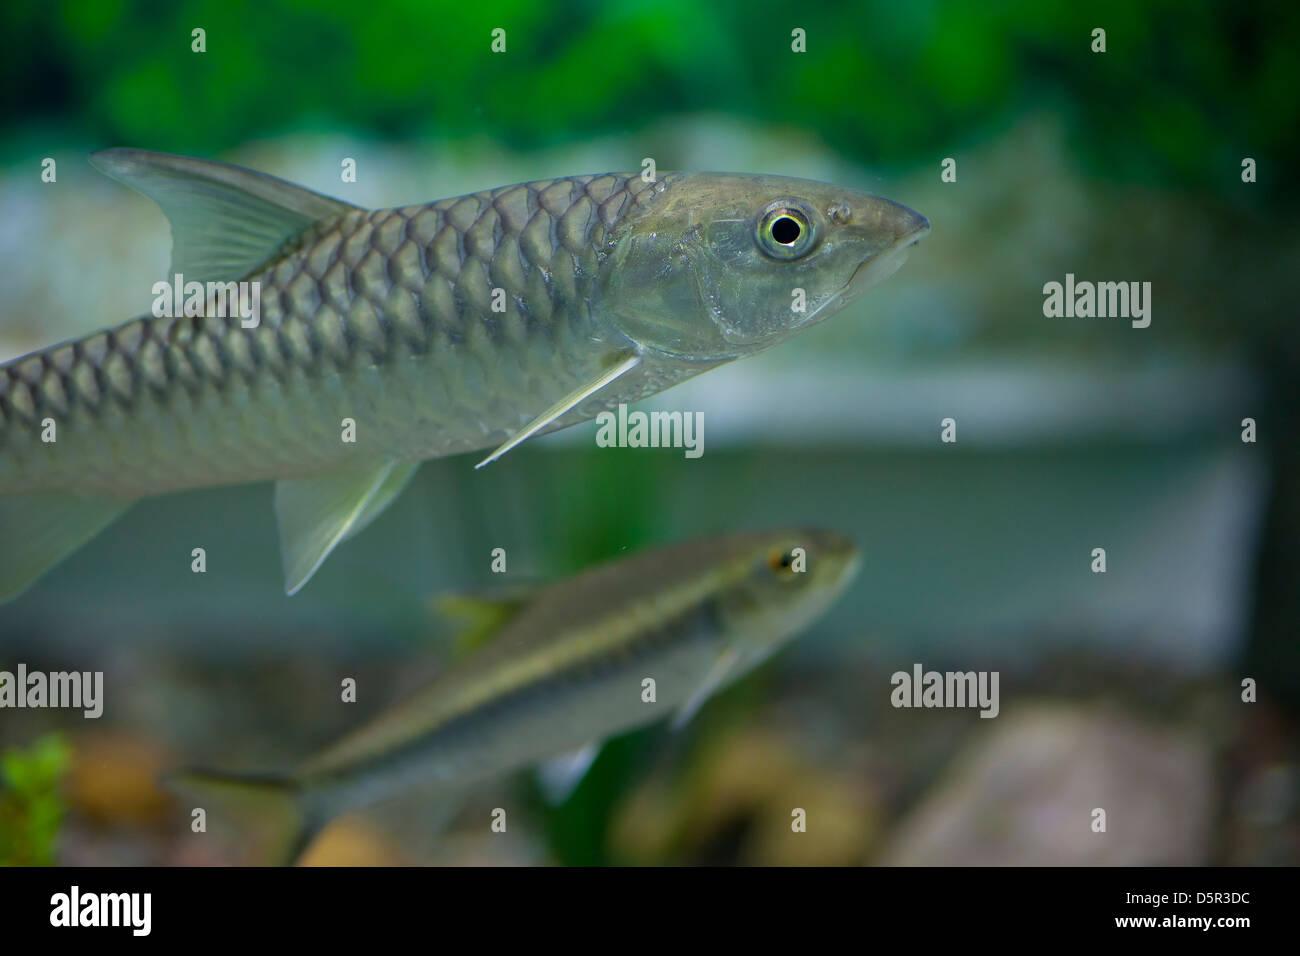 Fish in tank swimming - Aquarium Fish Tank Fish Swimming Animal Animal And Pets Fresh Water Fish Nature Tropical Climate India